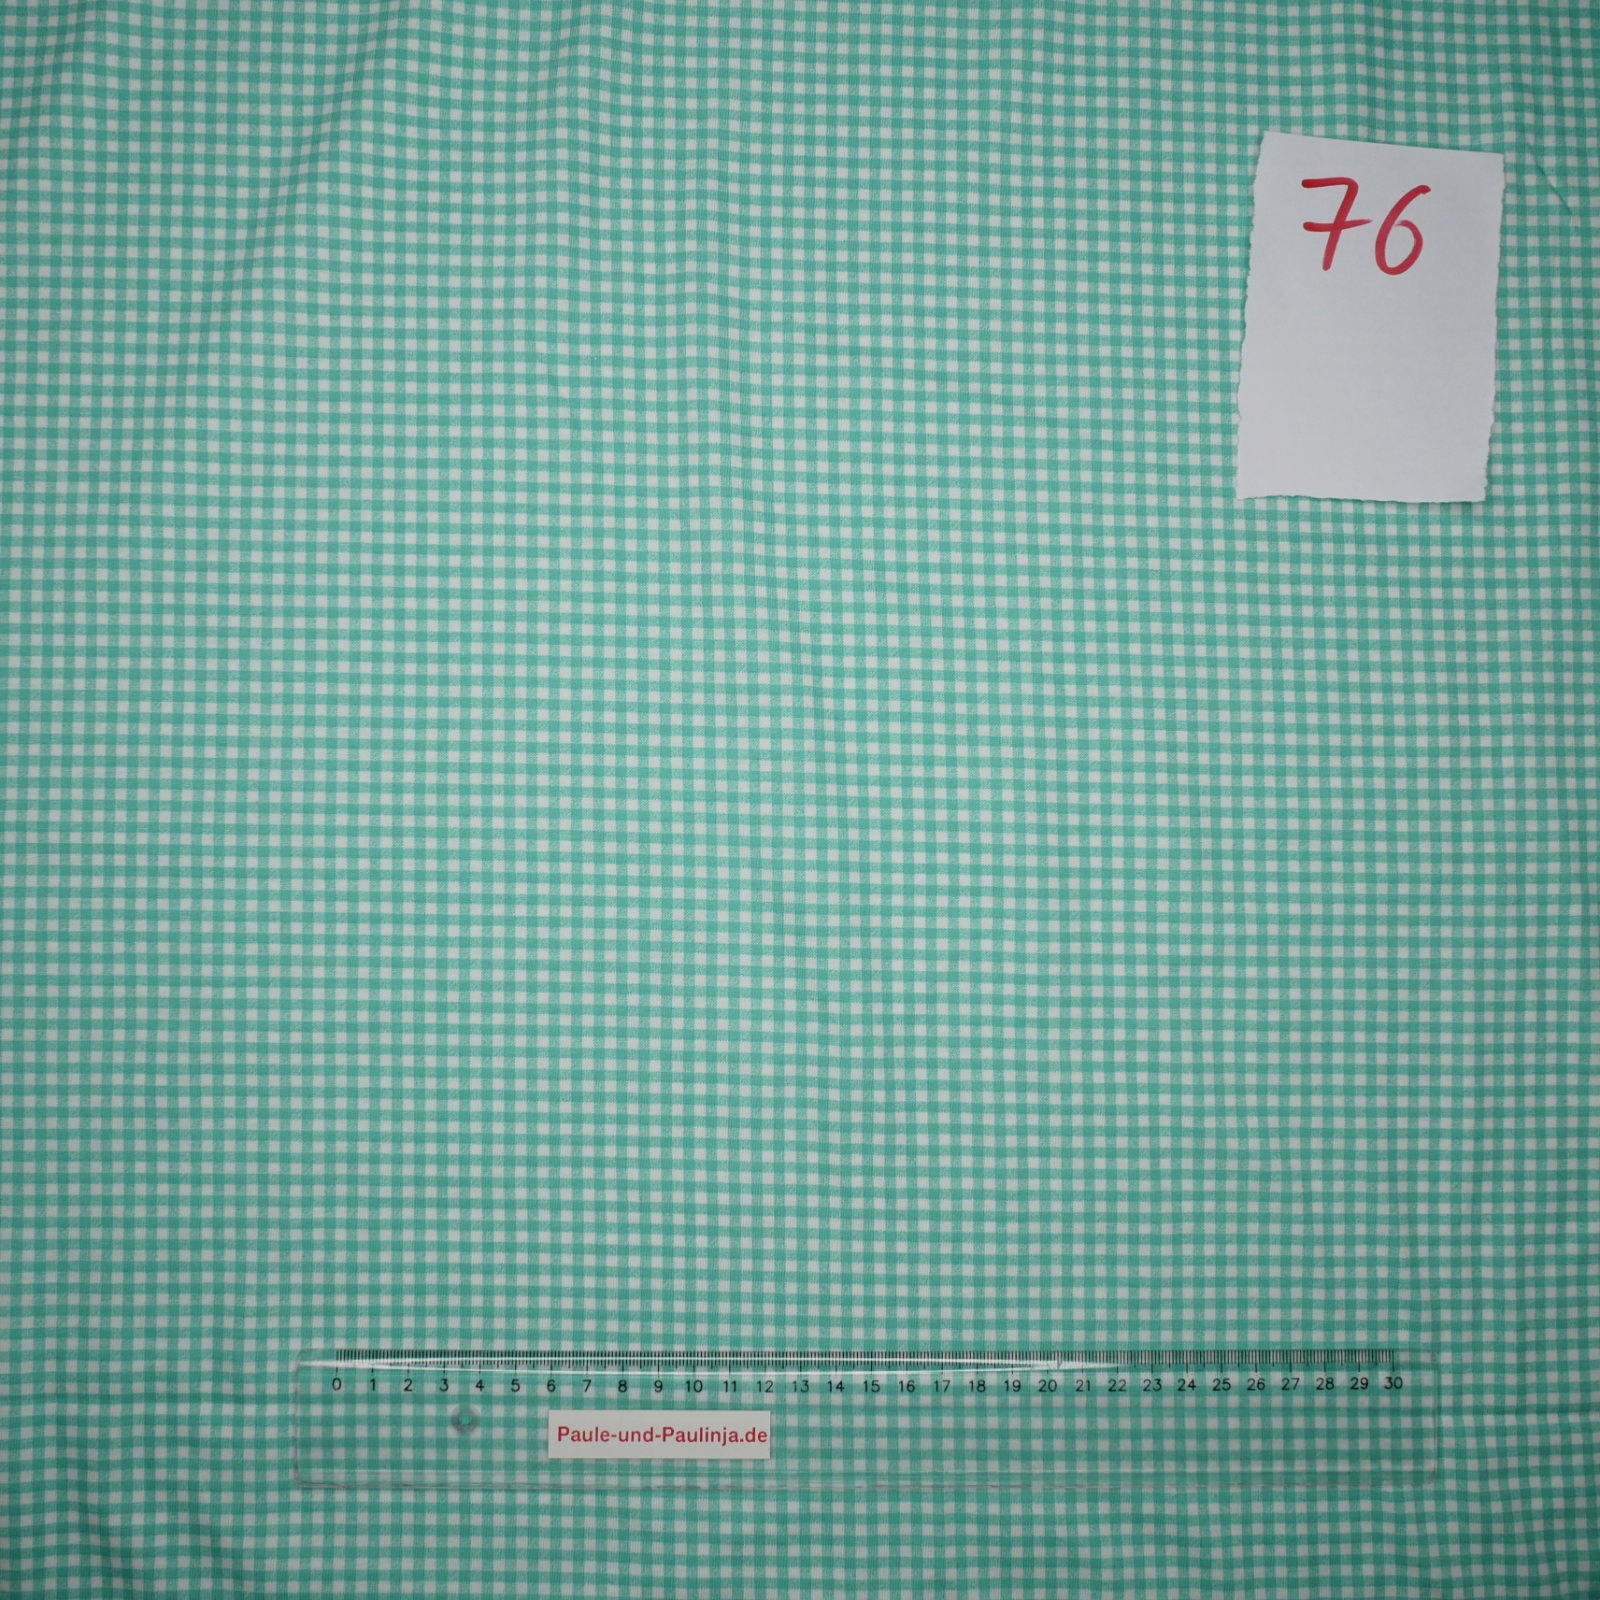 0b2f52e70eec Baumwolle Stretch Jersey, dünn, blaugrün weiß kariert - OV076